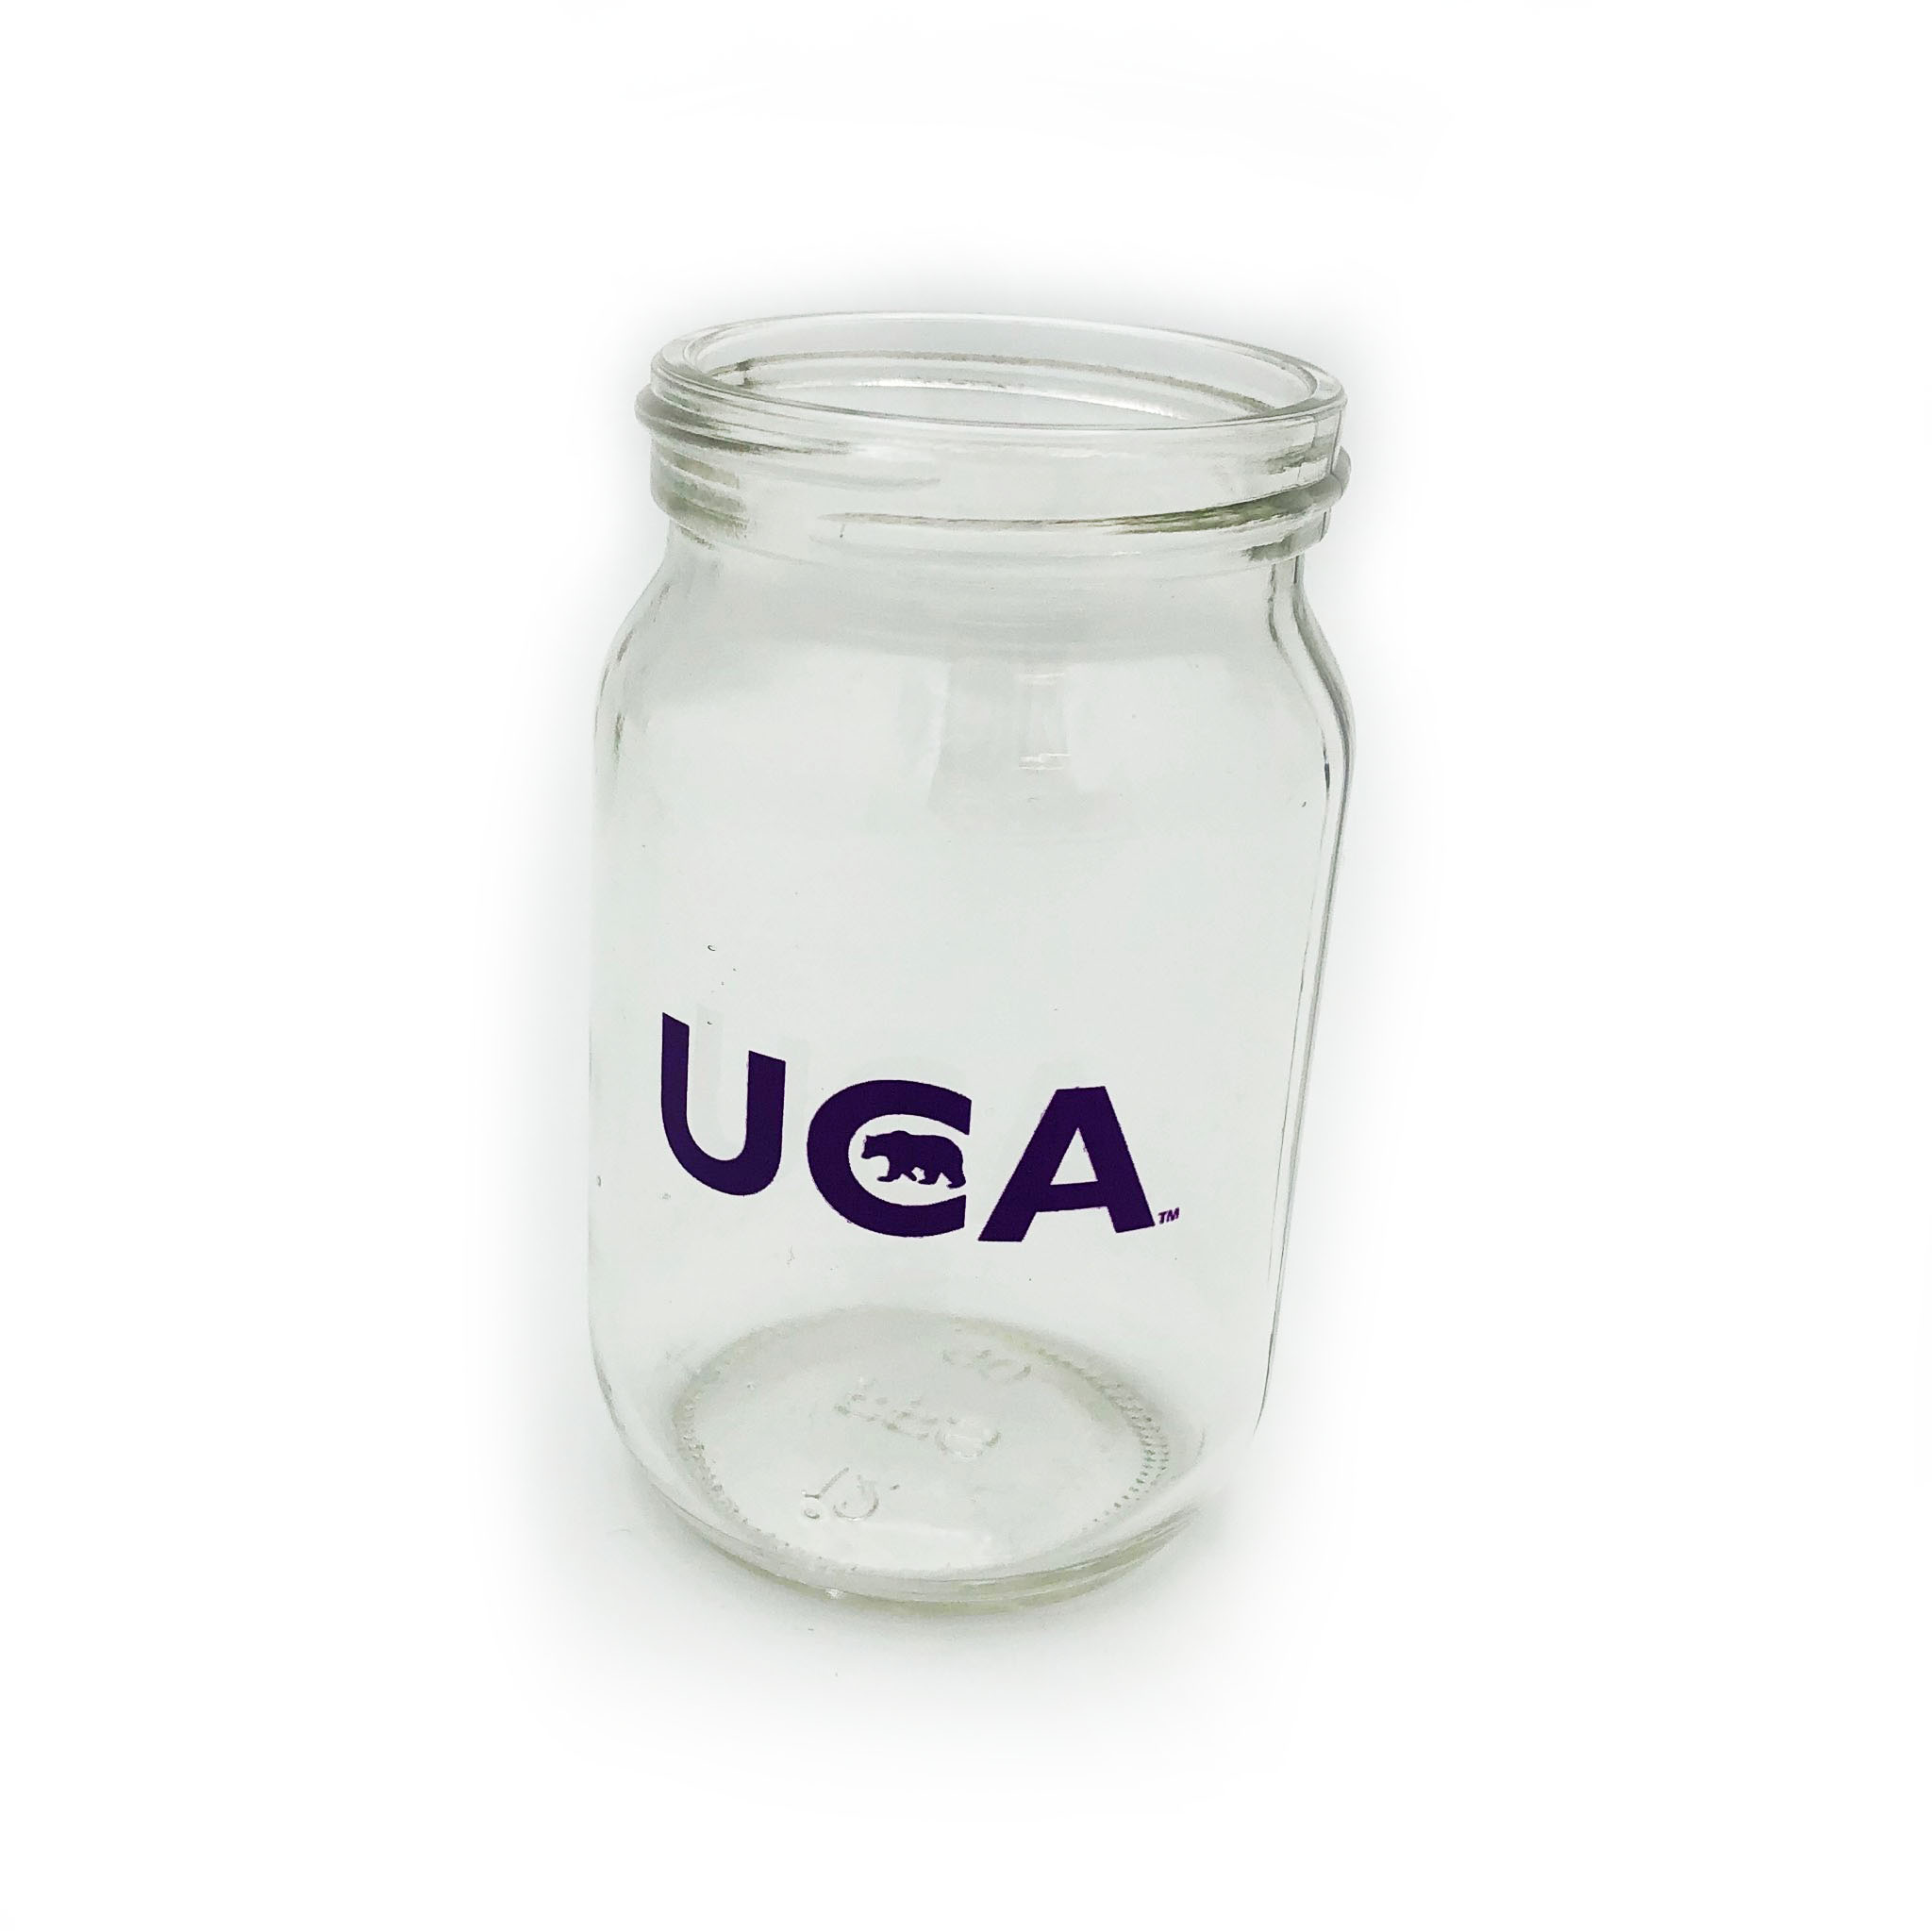 UCA Jar Shot Glass 4oz